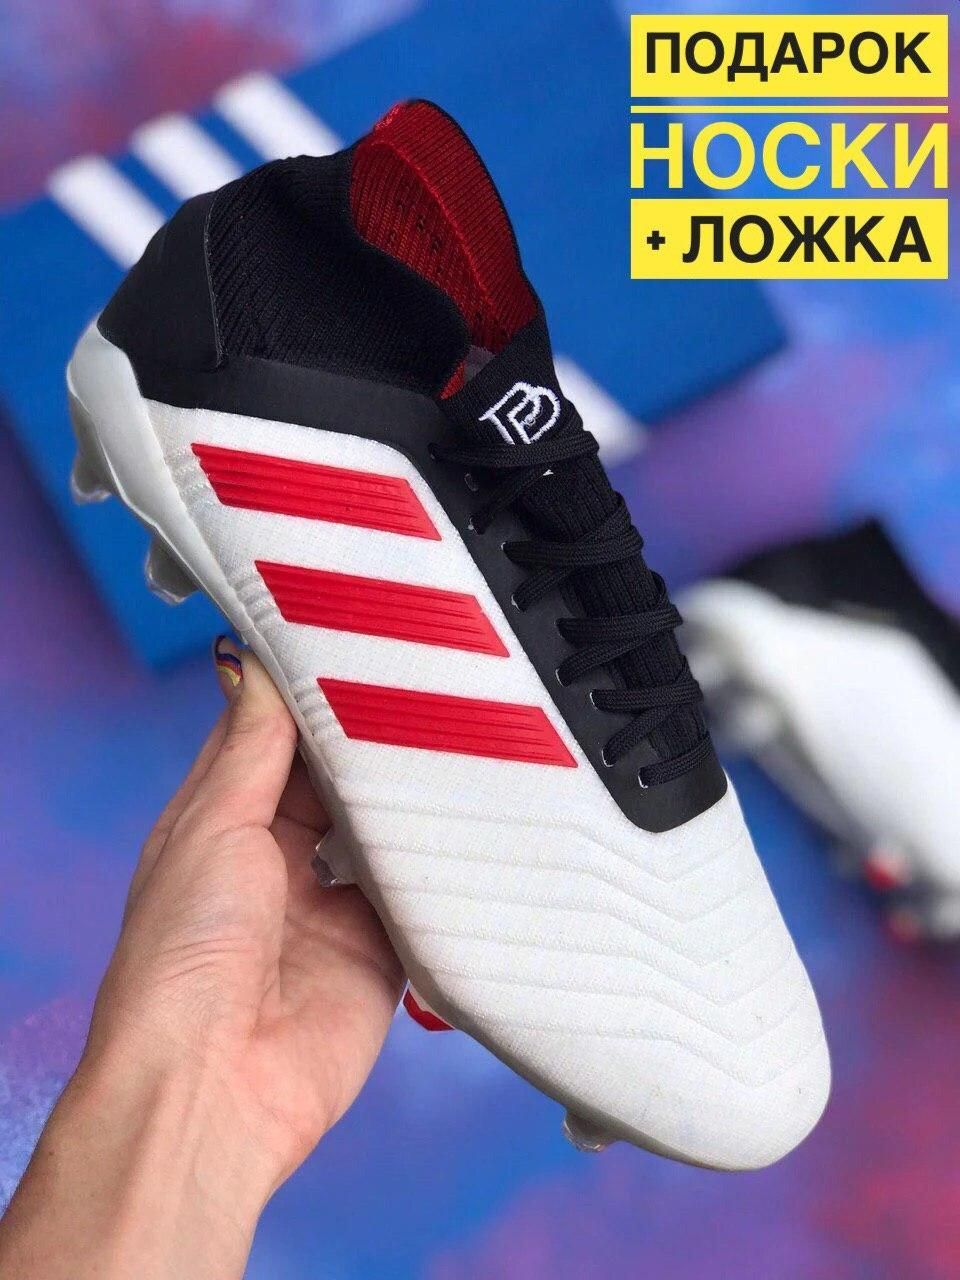 Бутси Adidas Predator 19+FG Paul Pogba(адідас предатор поль погба)